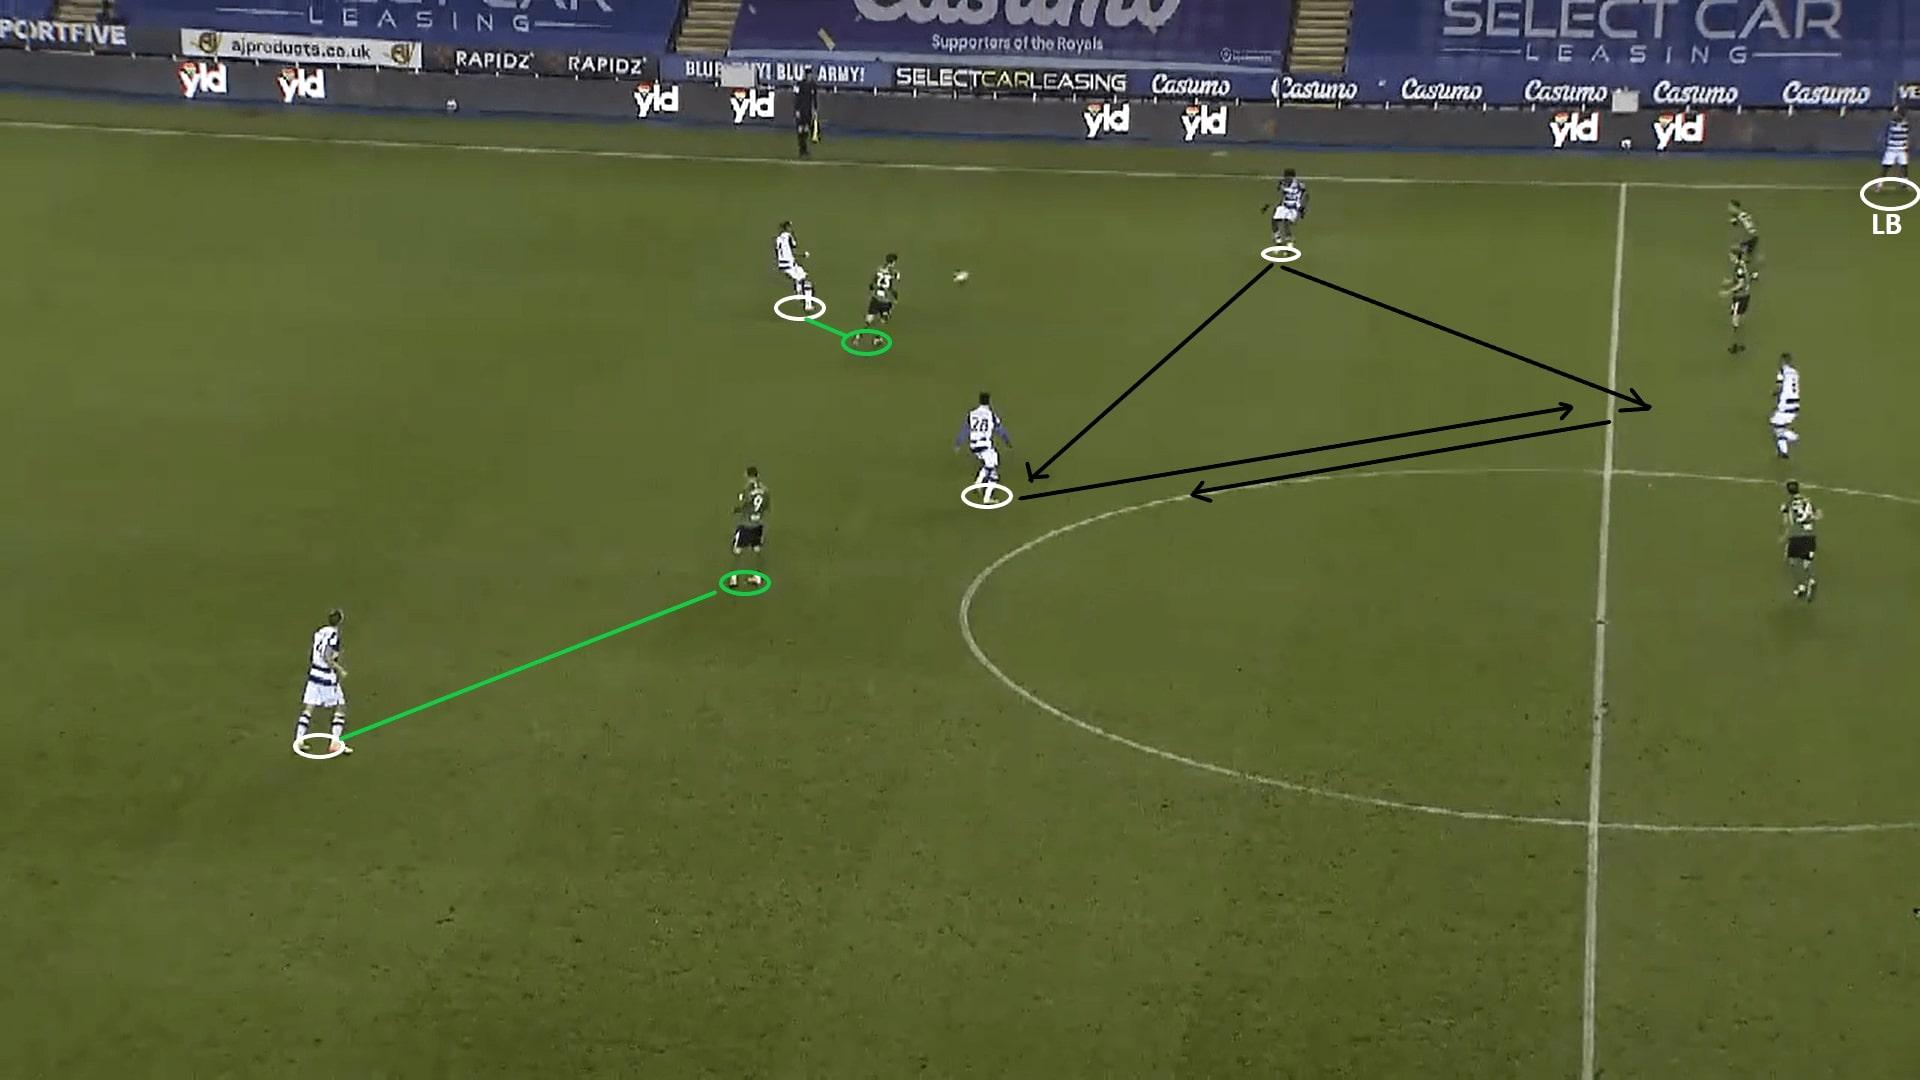 EFL Championship 2020/21: Birmingham City - scout report - tactical analysis - tactics